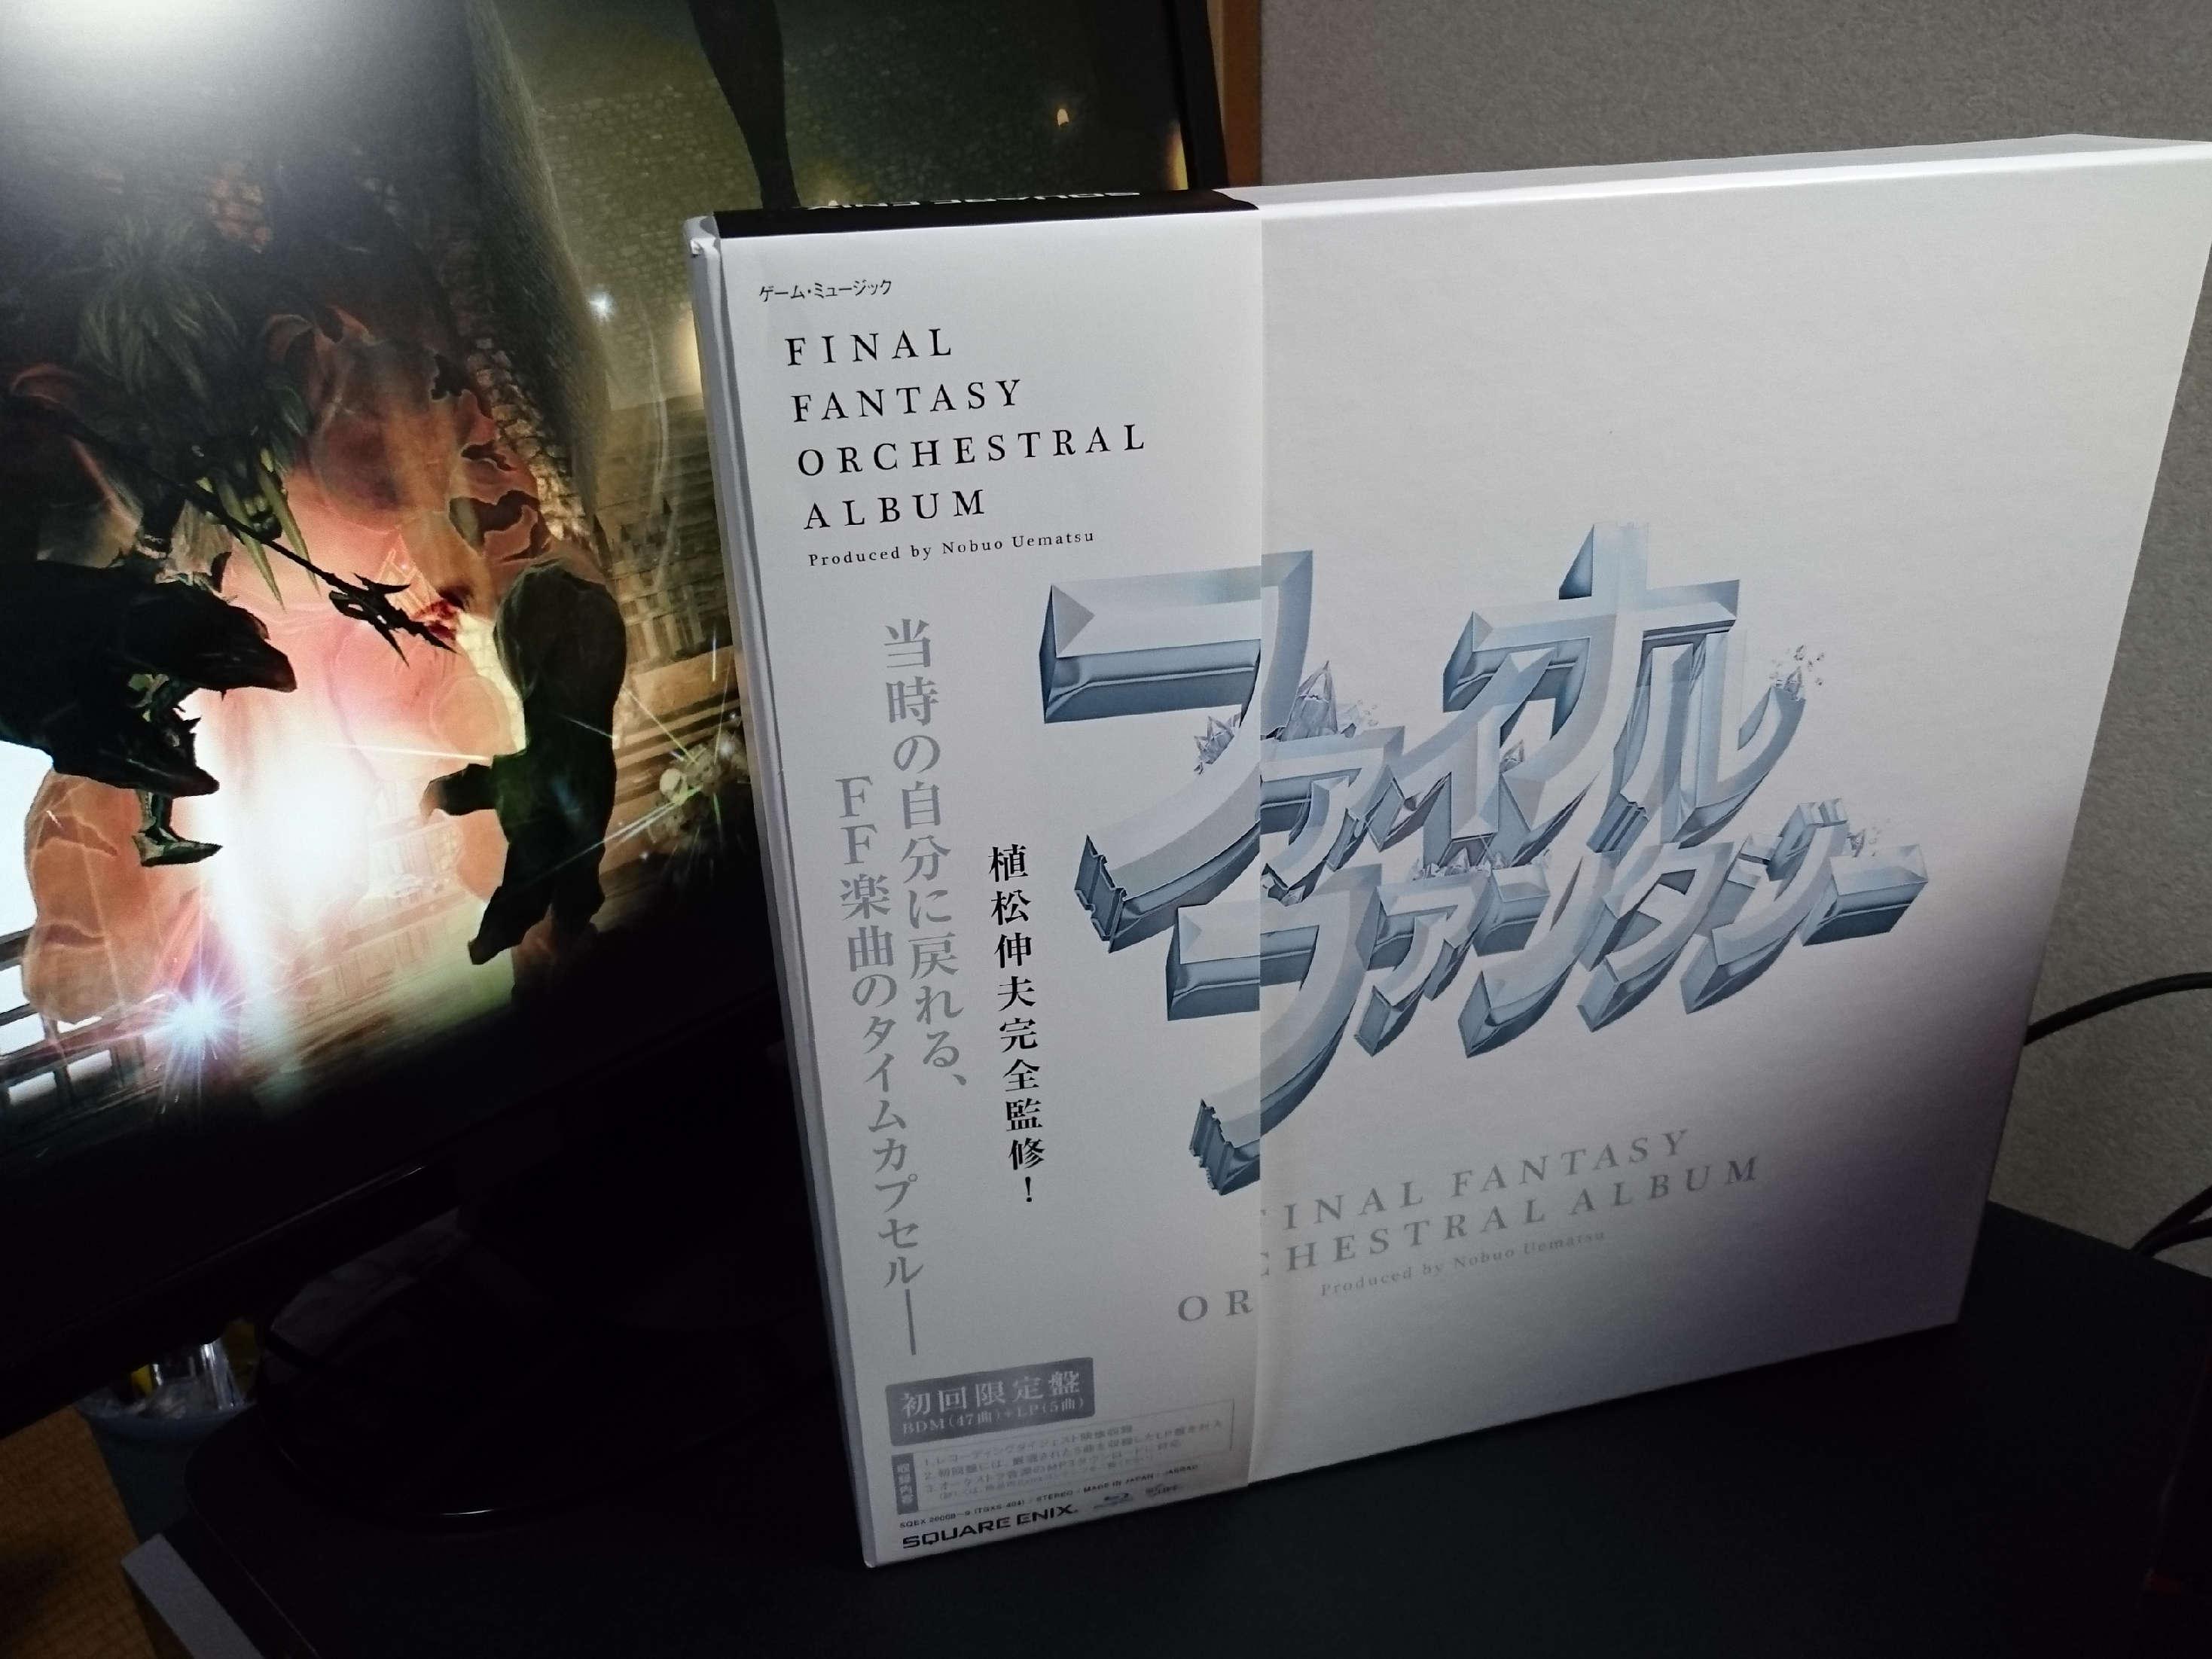 FINAL FANTSY ORCHESTRAL ALBUM